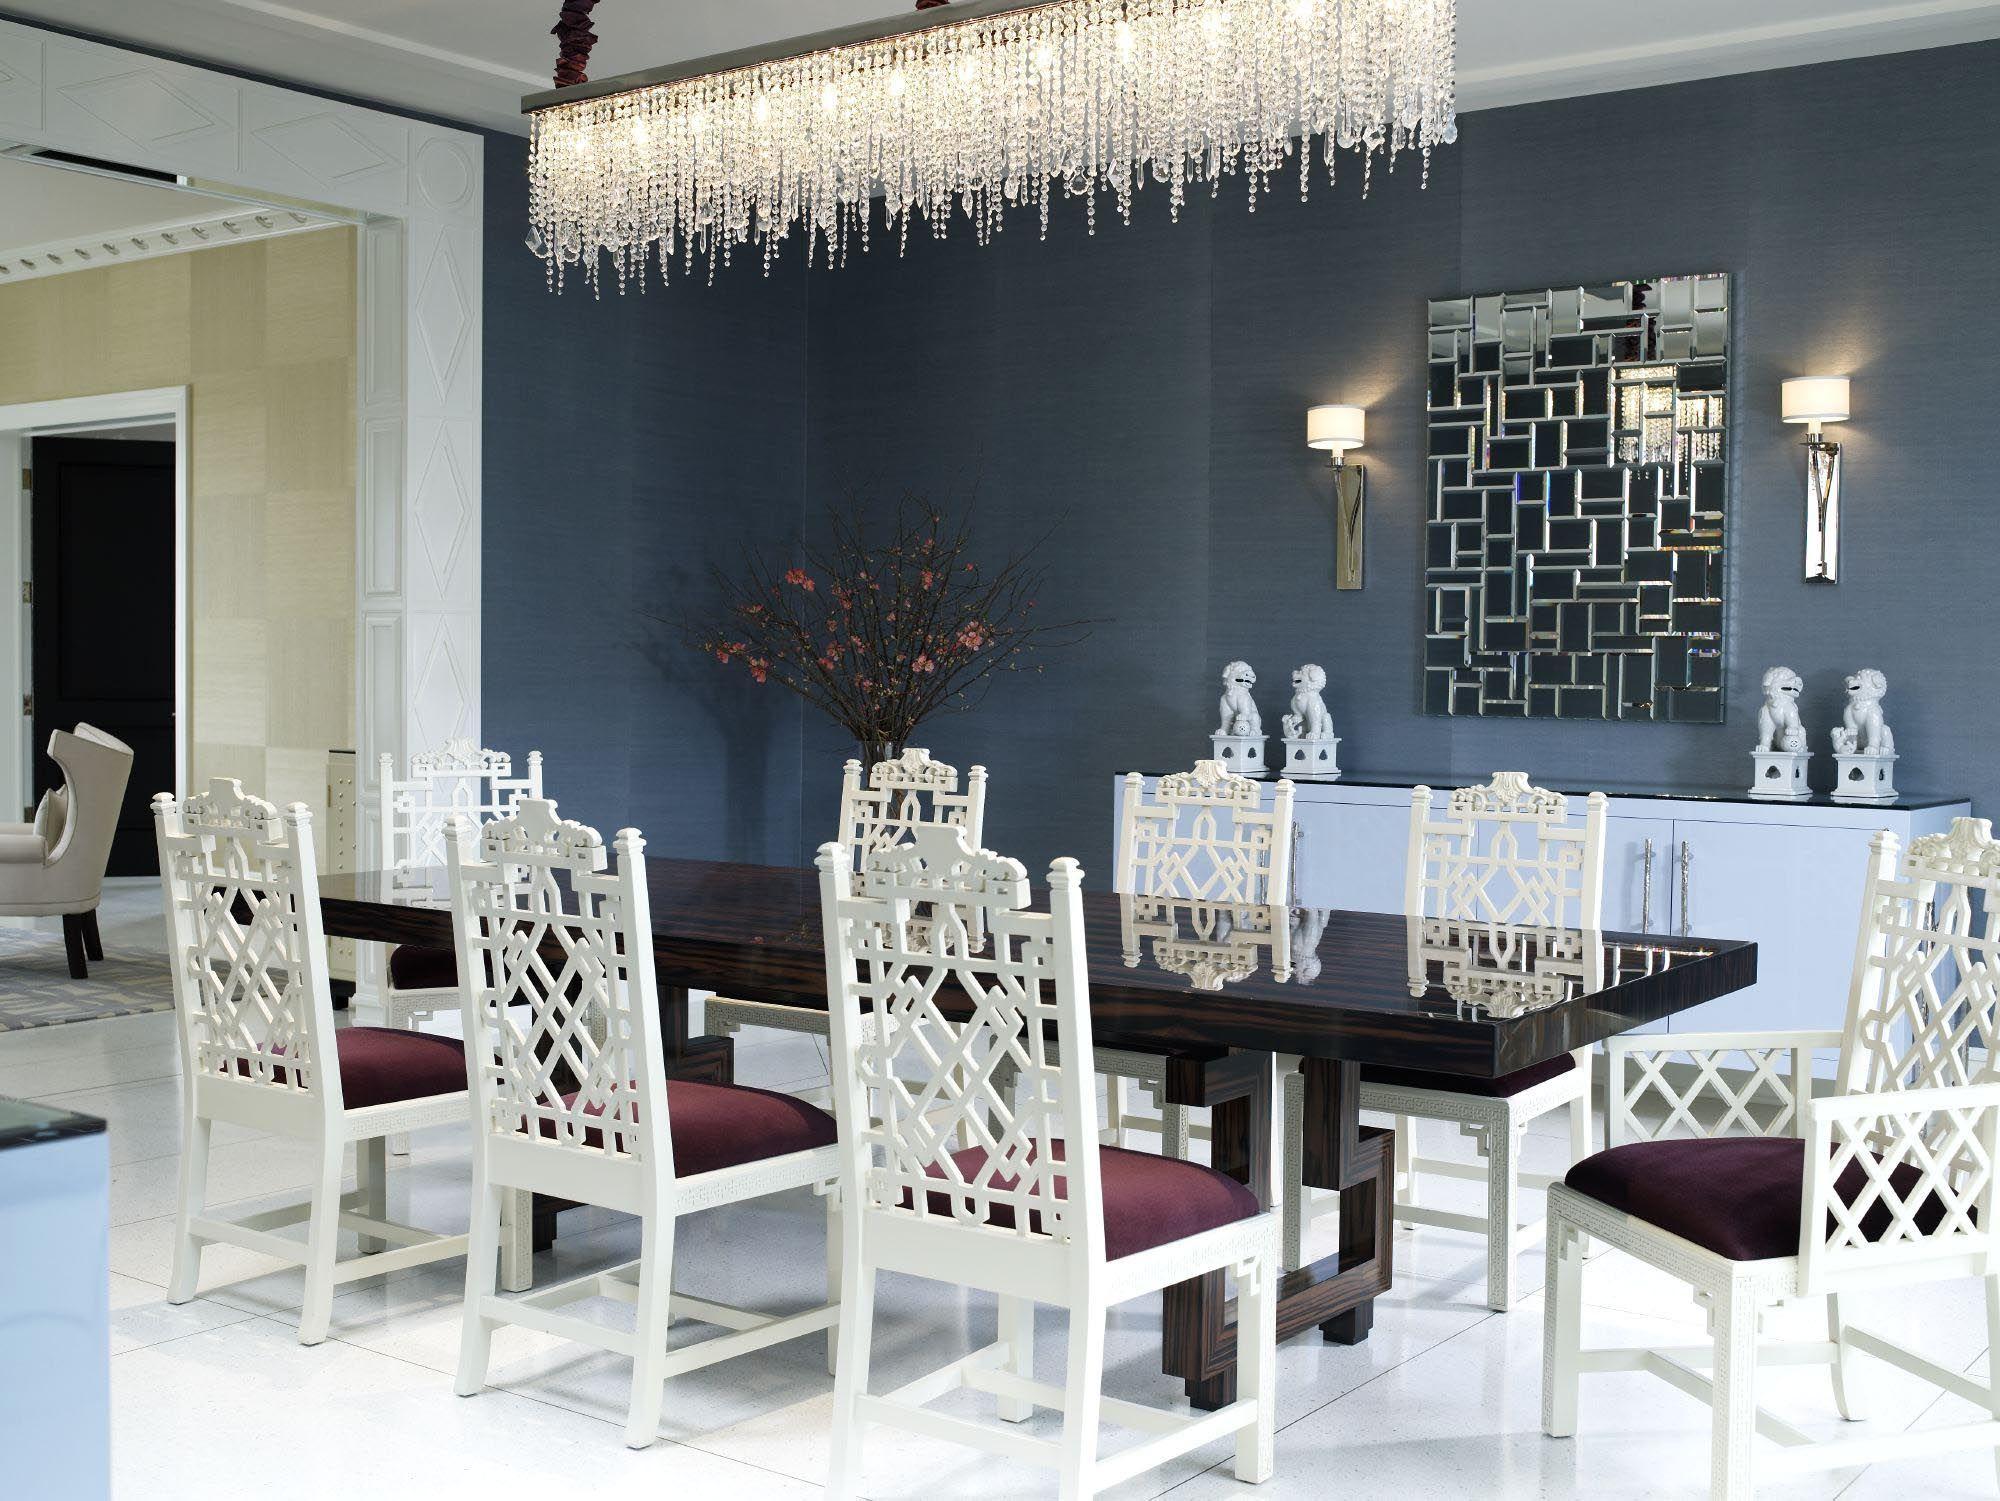 Lighting Fixtures Dining Area  Light Fixtures  Pinterest Entrancing Light Fixtures For Dining Room Inspiration